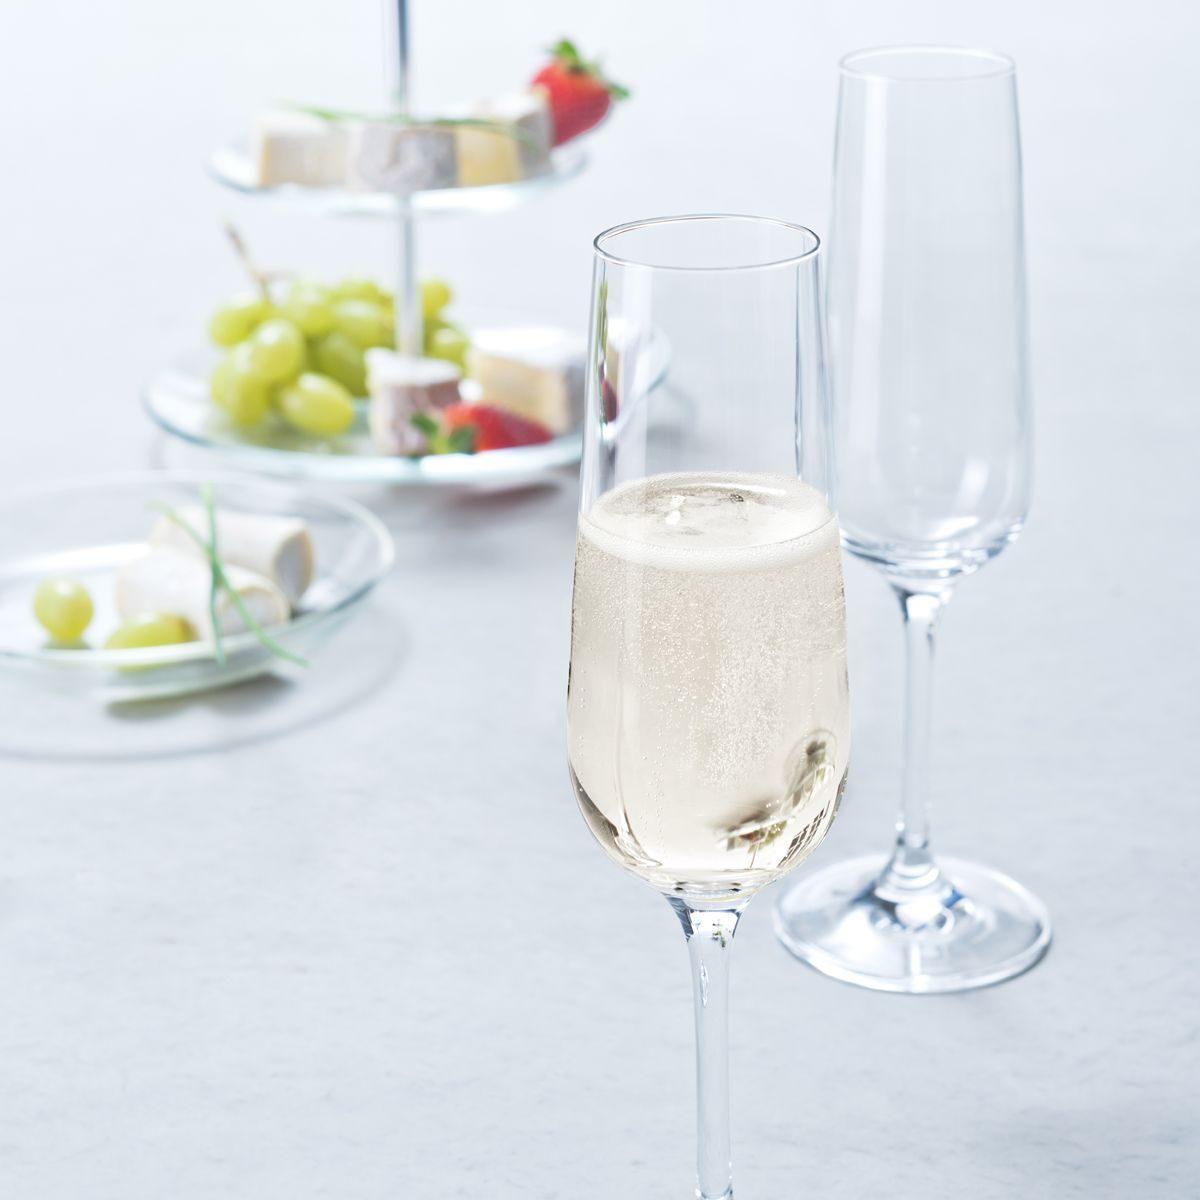 020962 3 k 1200x1200 - Pahar pentru șampanie Tivoli 210 ml (L020962)